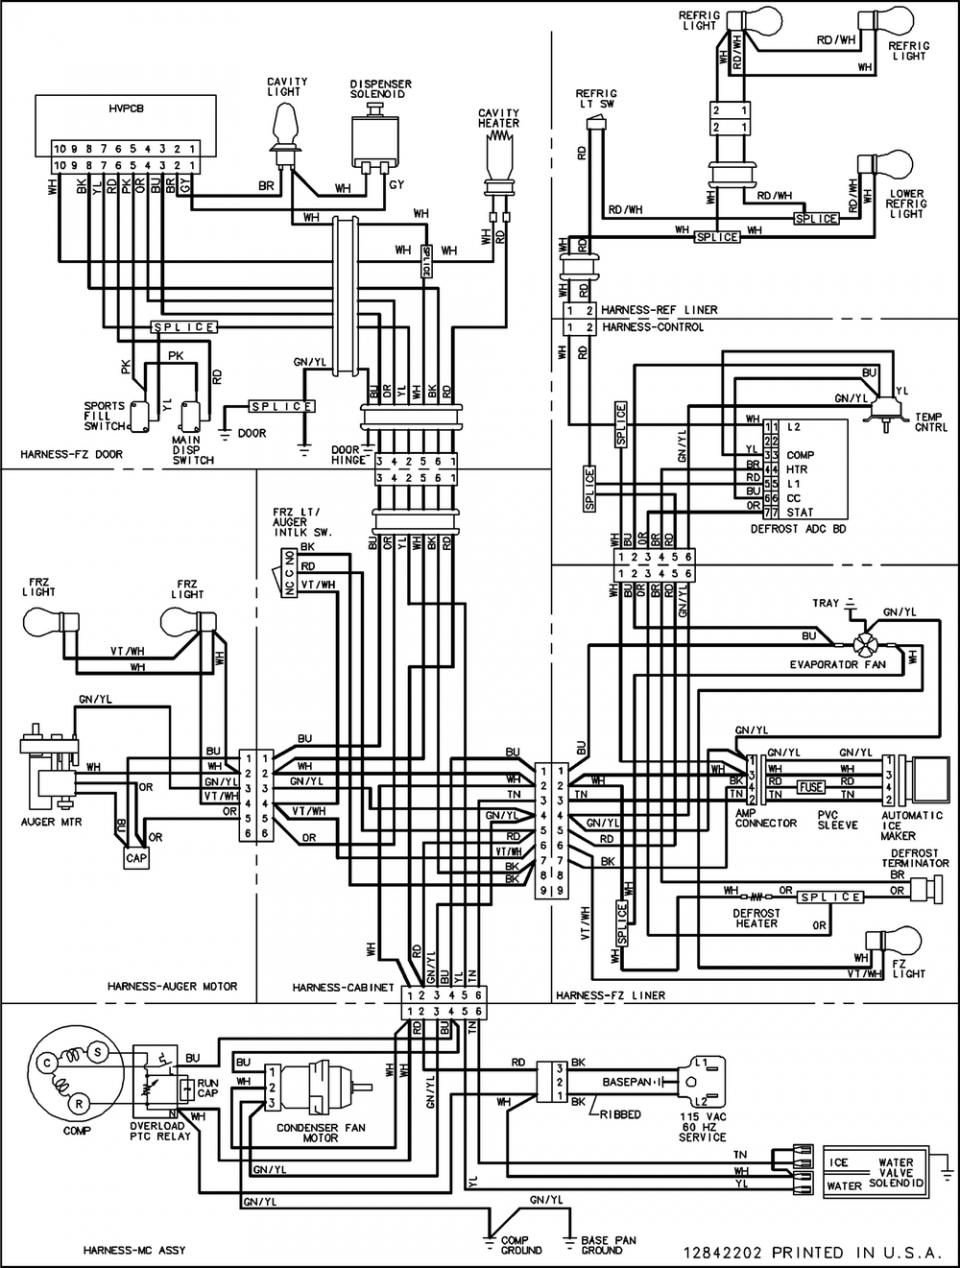 Amana Ptac Wiring Diagram Kohler Engine Wiring Diagrams Camry Cooling Fan  Diagram - desk.freeappsforkids.co.ukWires